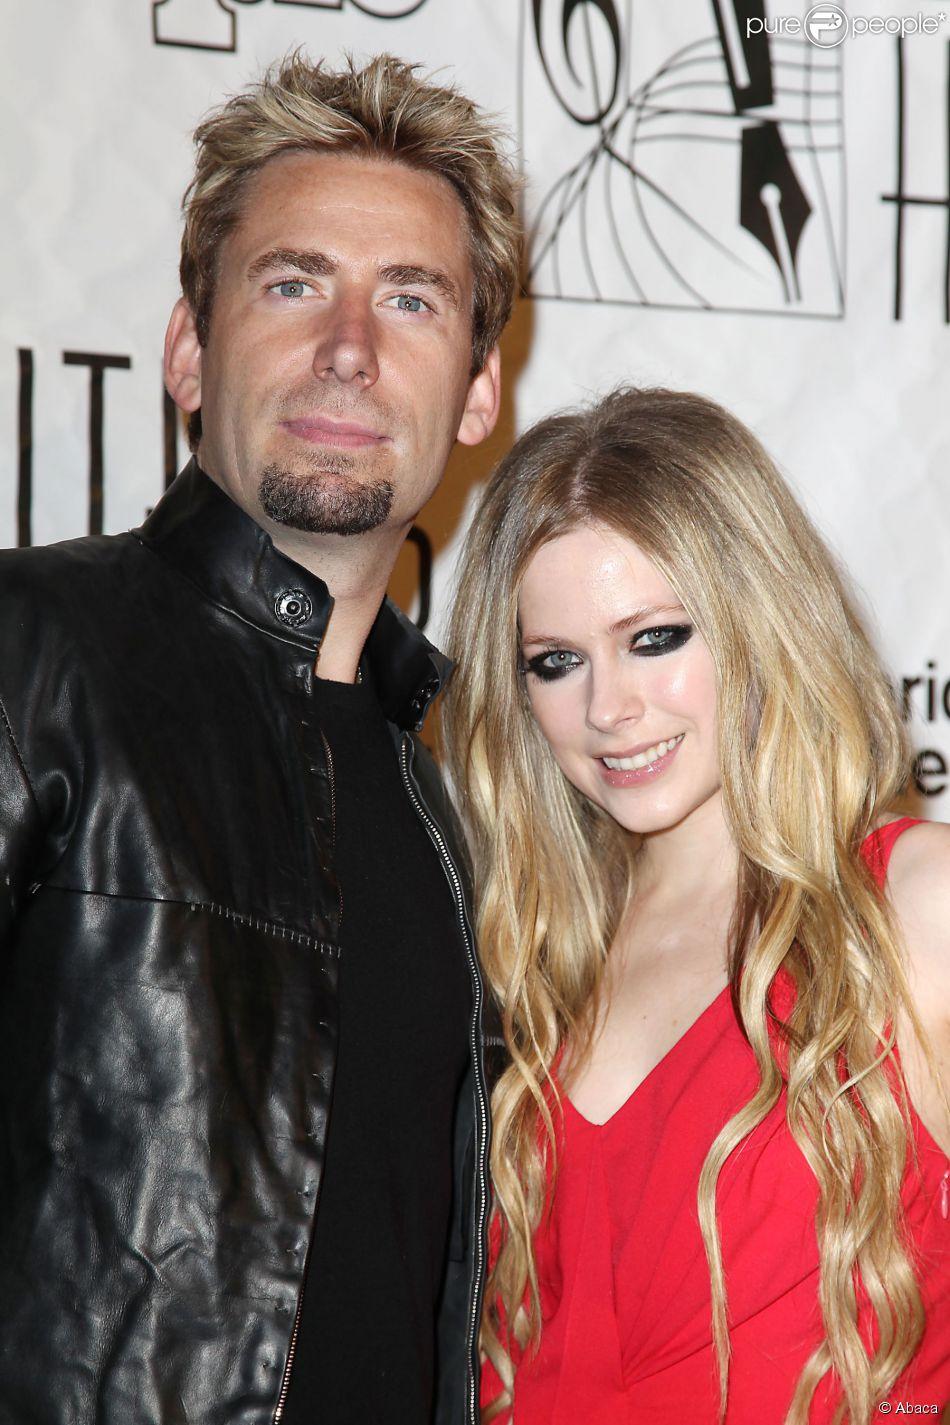 Avril Lavigne pipe normal porno gay